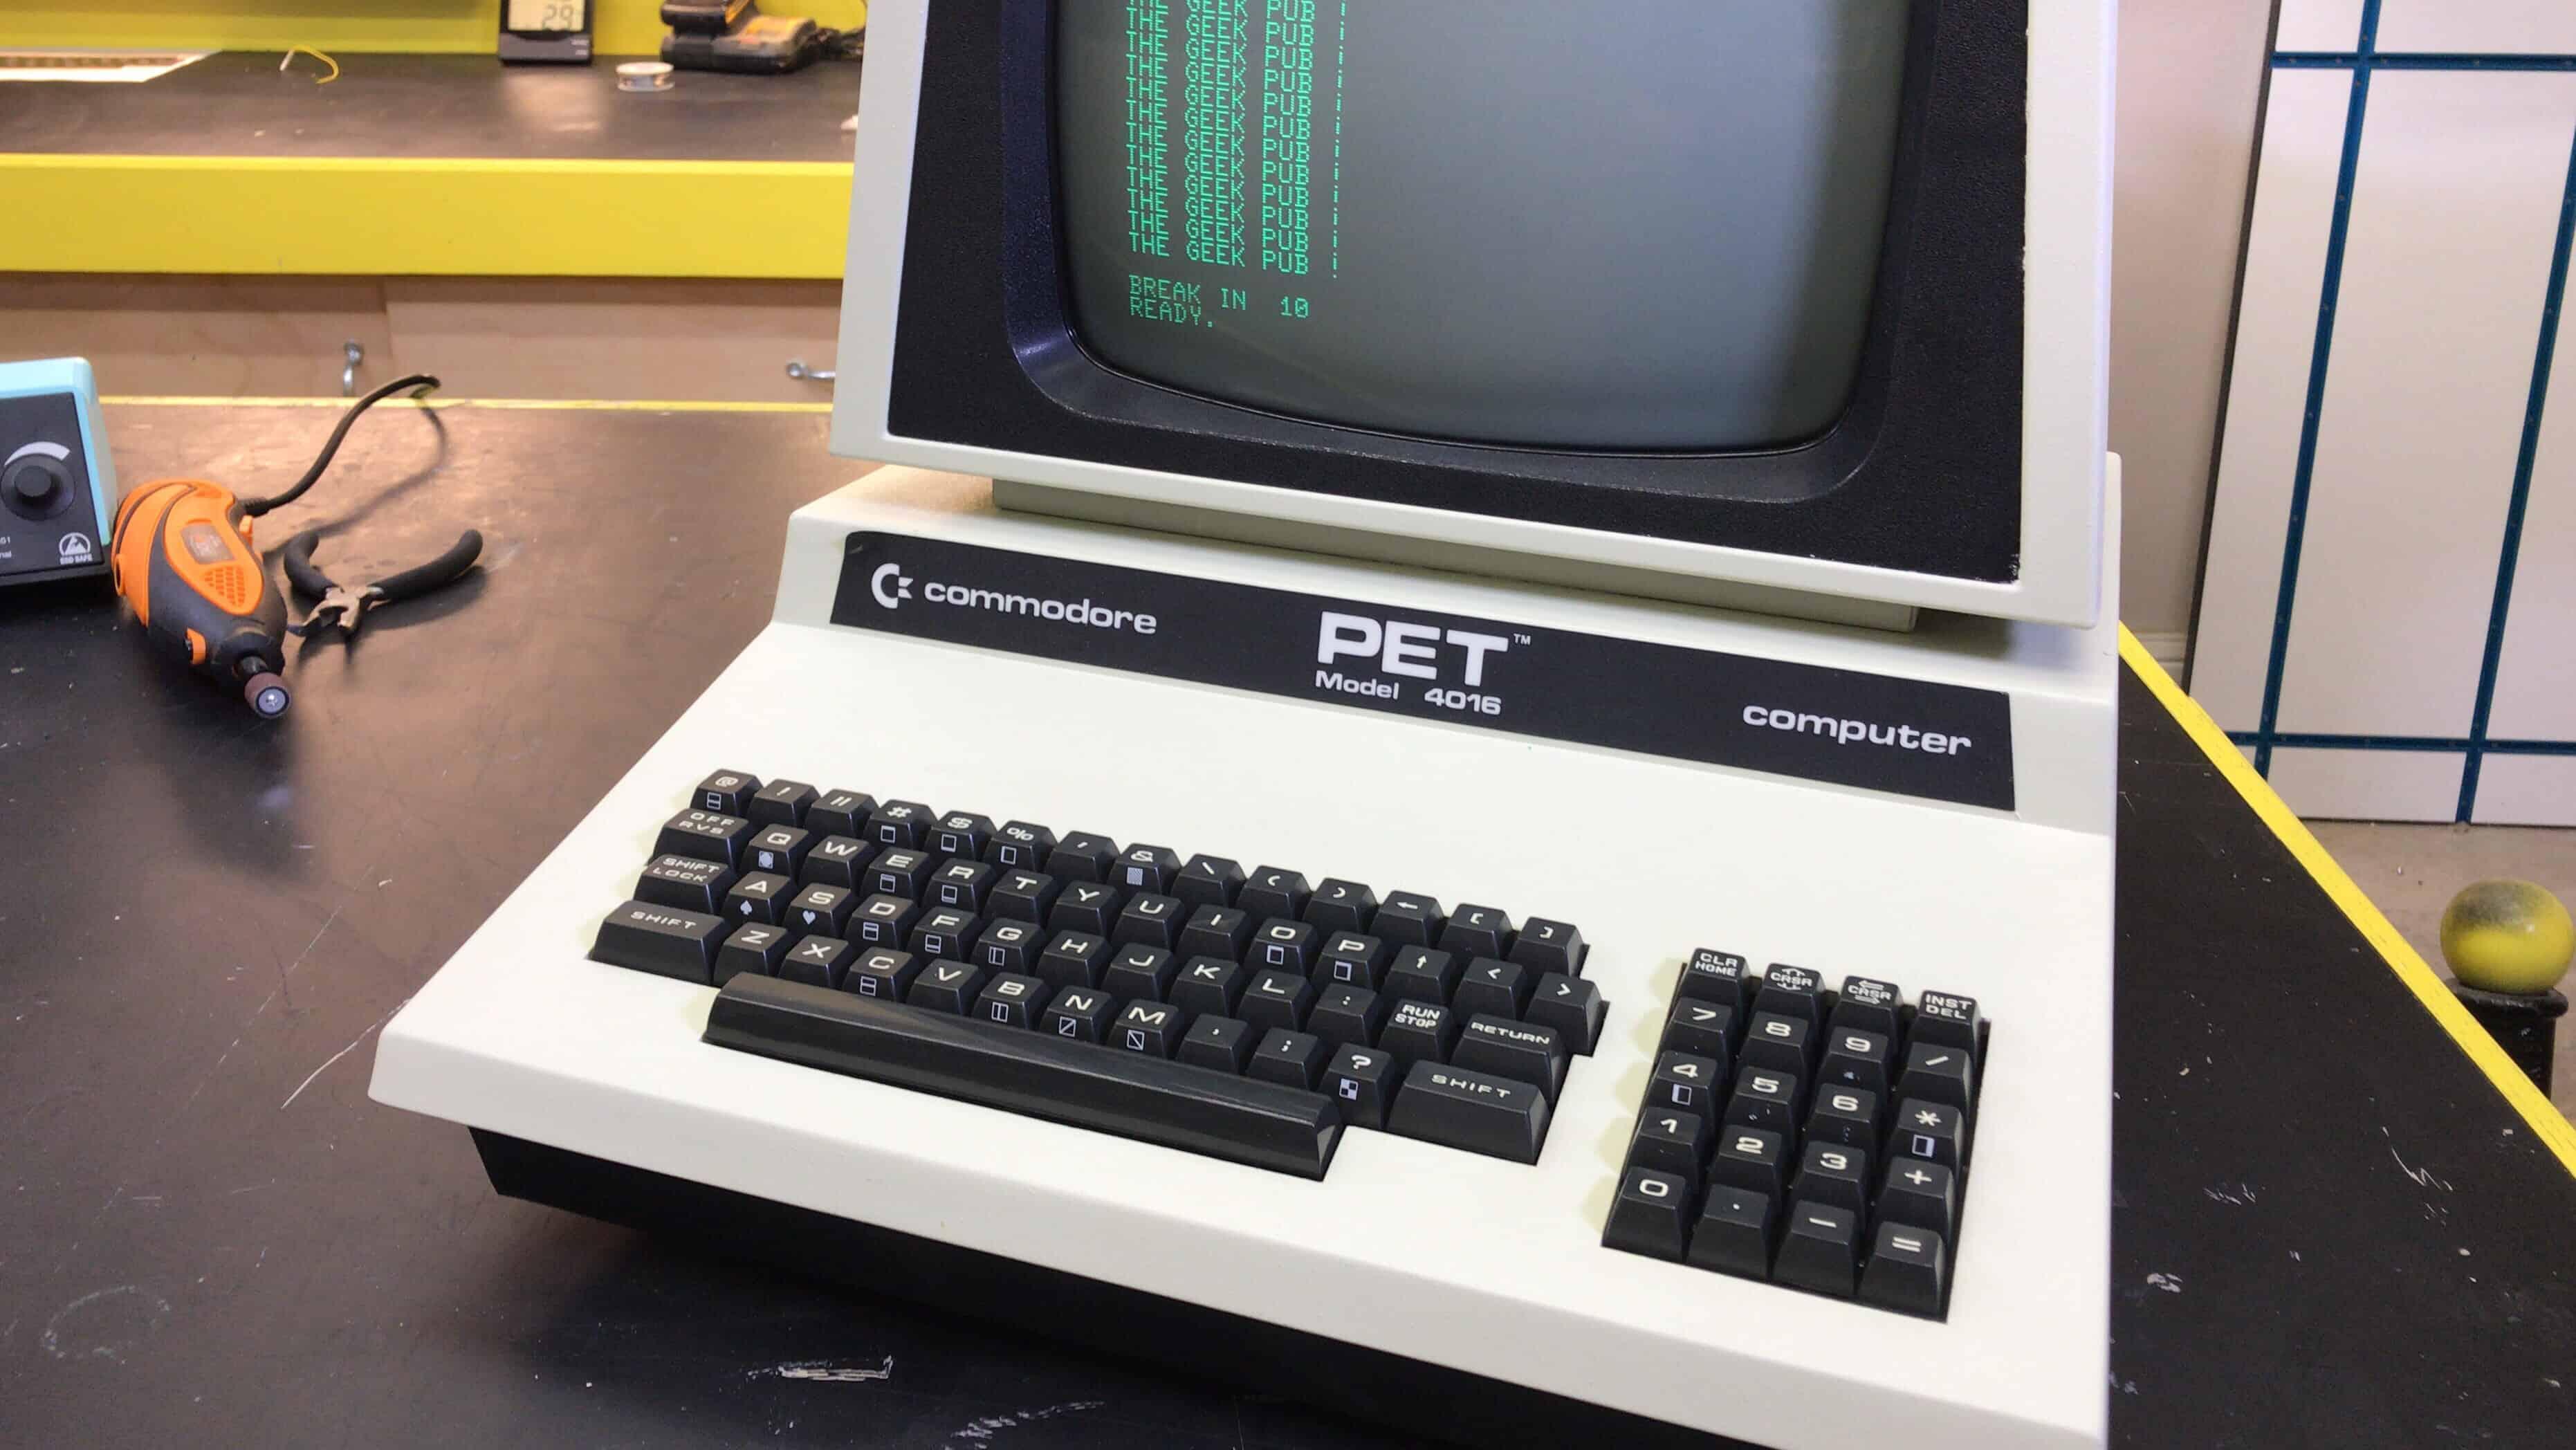 Repairing the Commodore PET 4016 - The Geek Pub